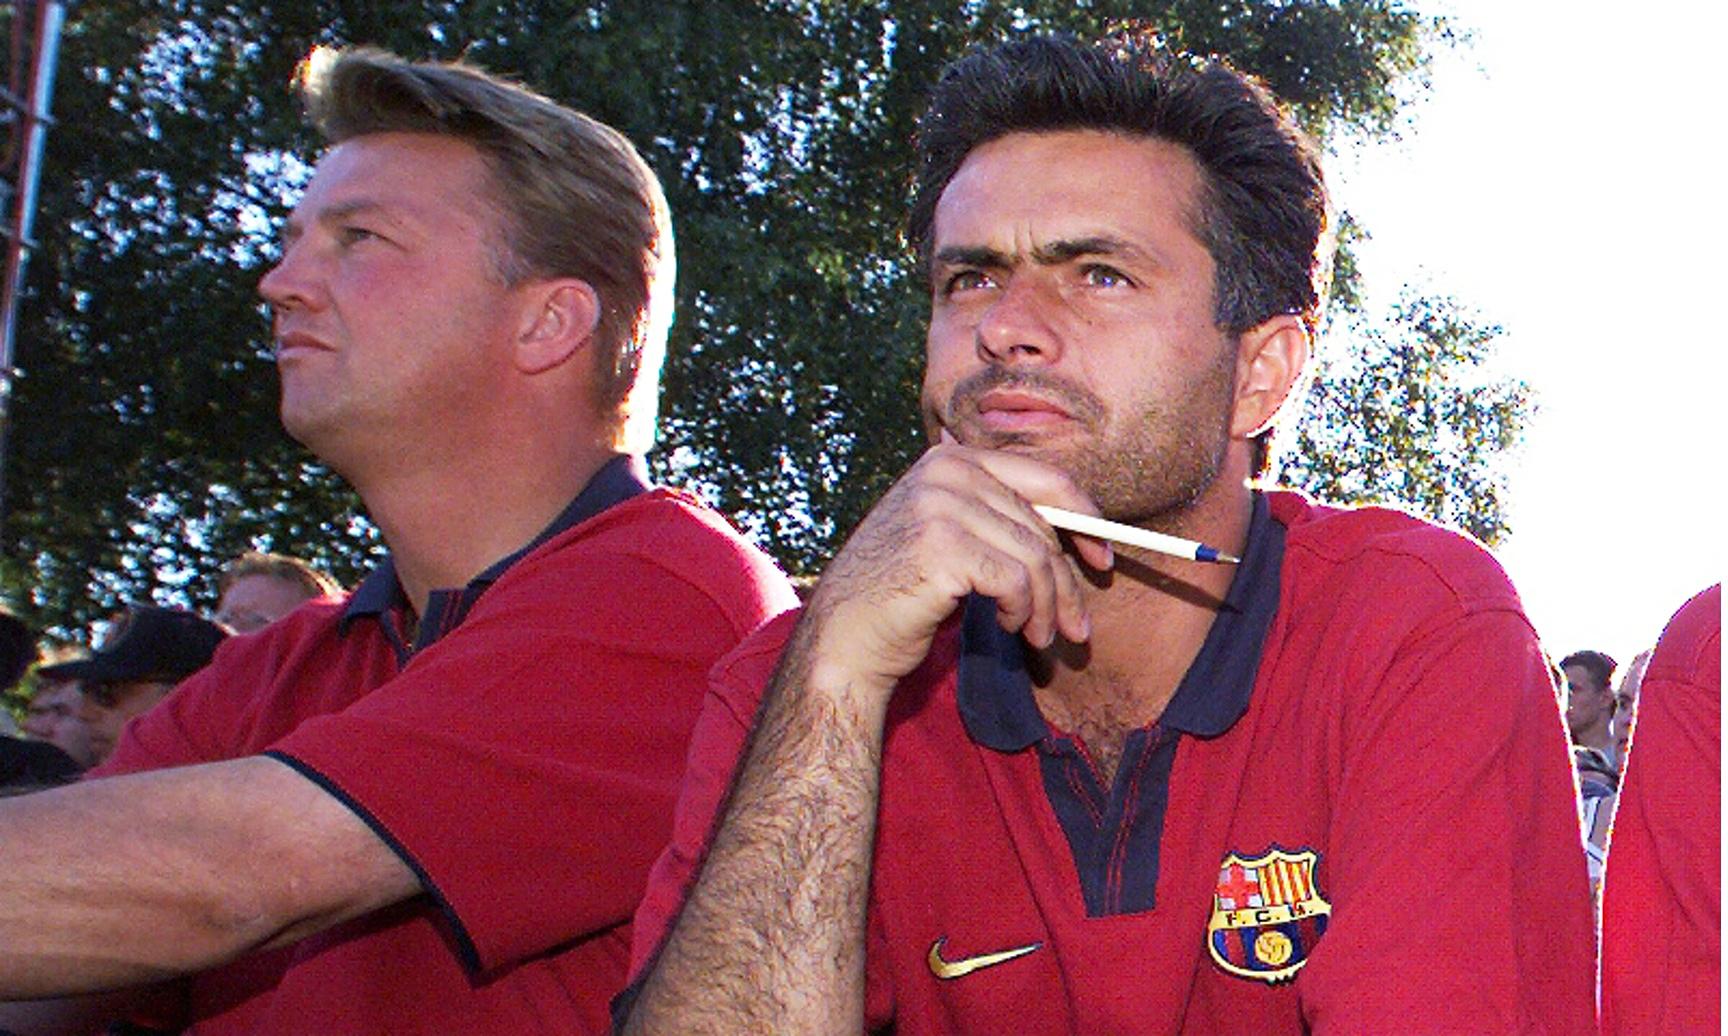 josé mourinho portré premier league barcelona porto chelsea jonathan wilson mcdeere